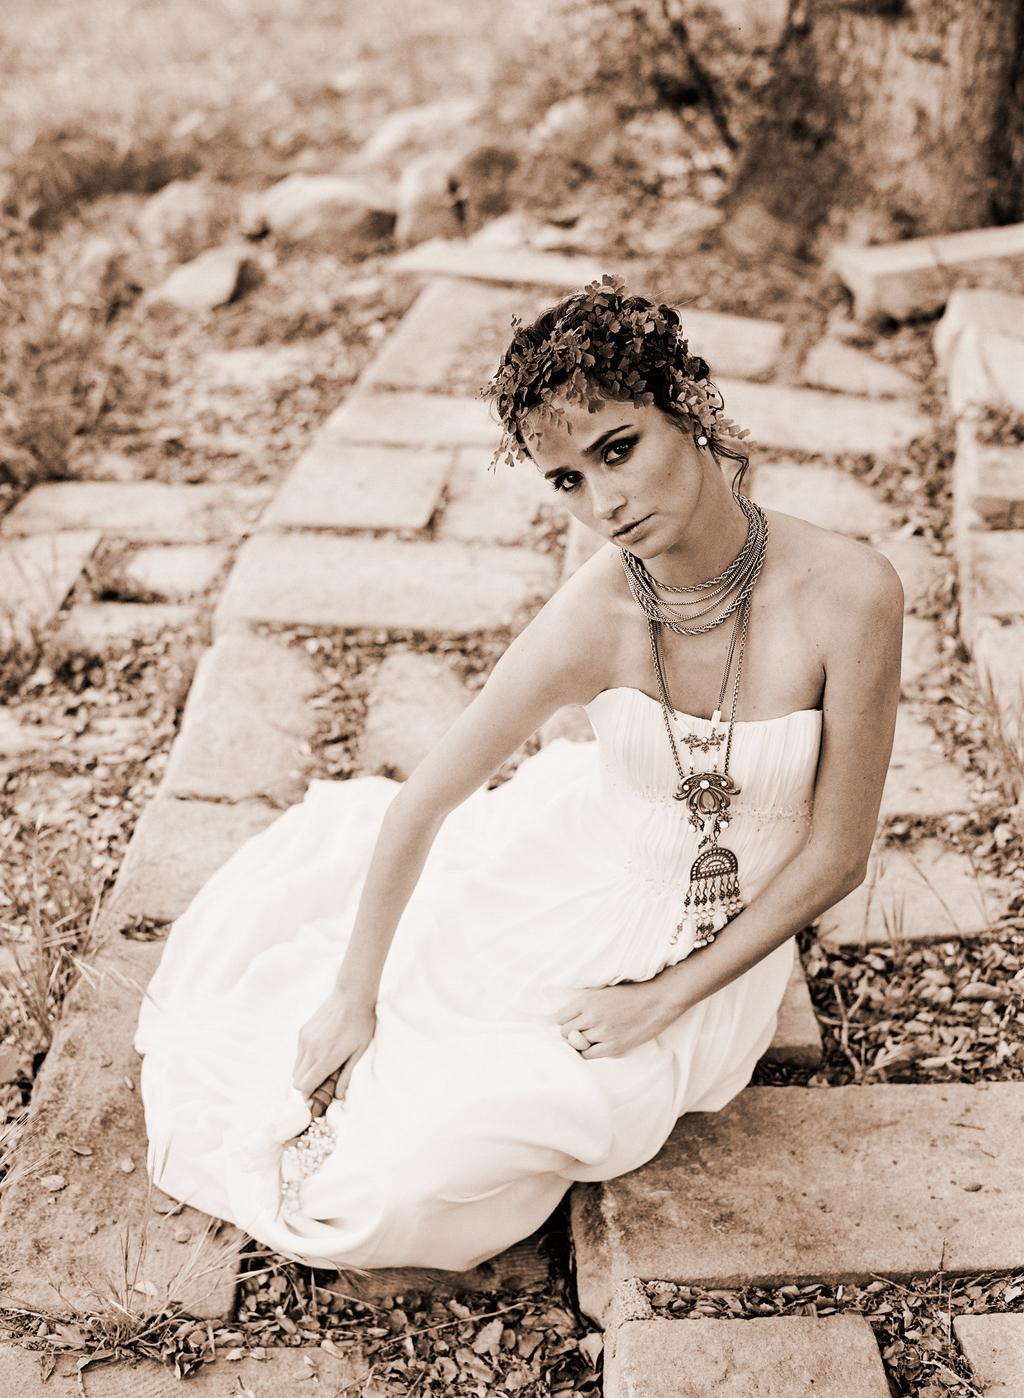 Styled-wedding-santa-barbara-chic-beaux-arts-phtographie-italian-bohemian-wedding-bride-wedding-dress-sepia-119.full